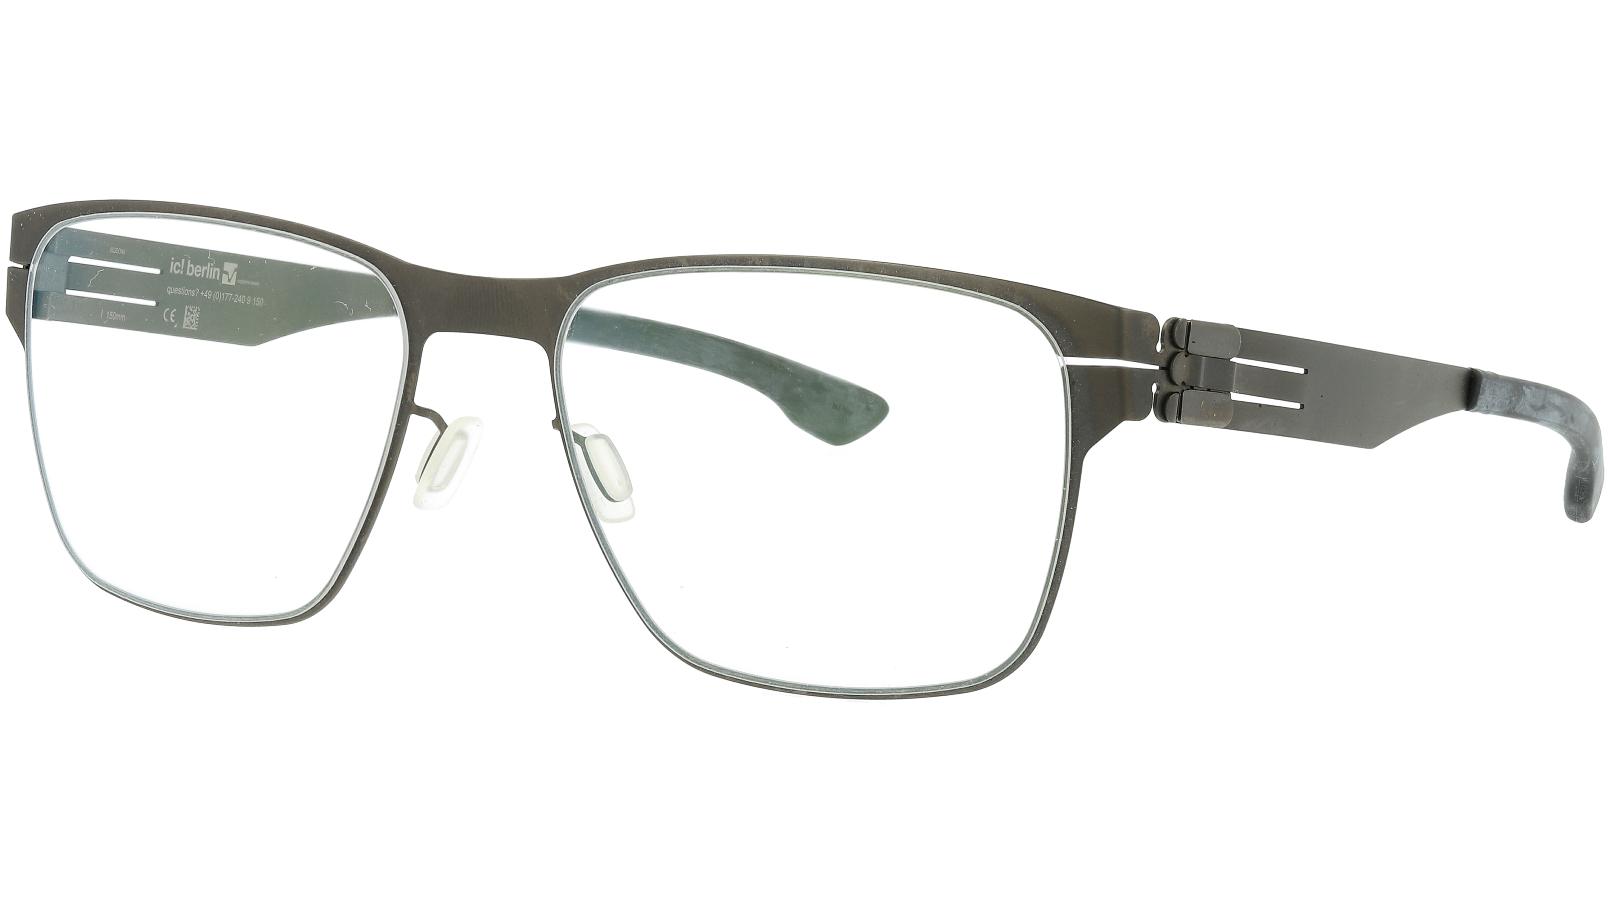 IC BERLIN! Hannes S Graphite Grey Glasses